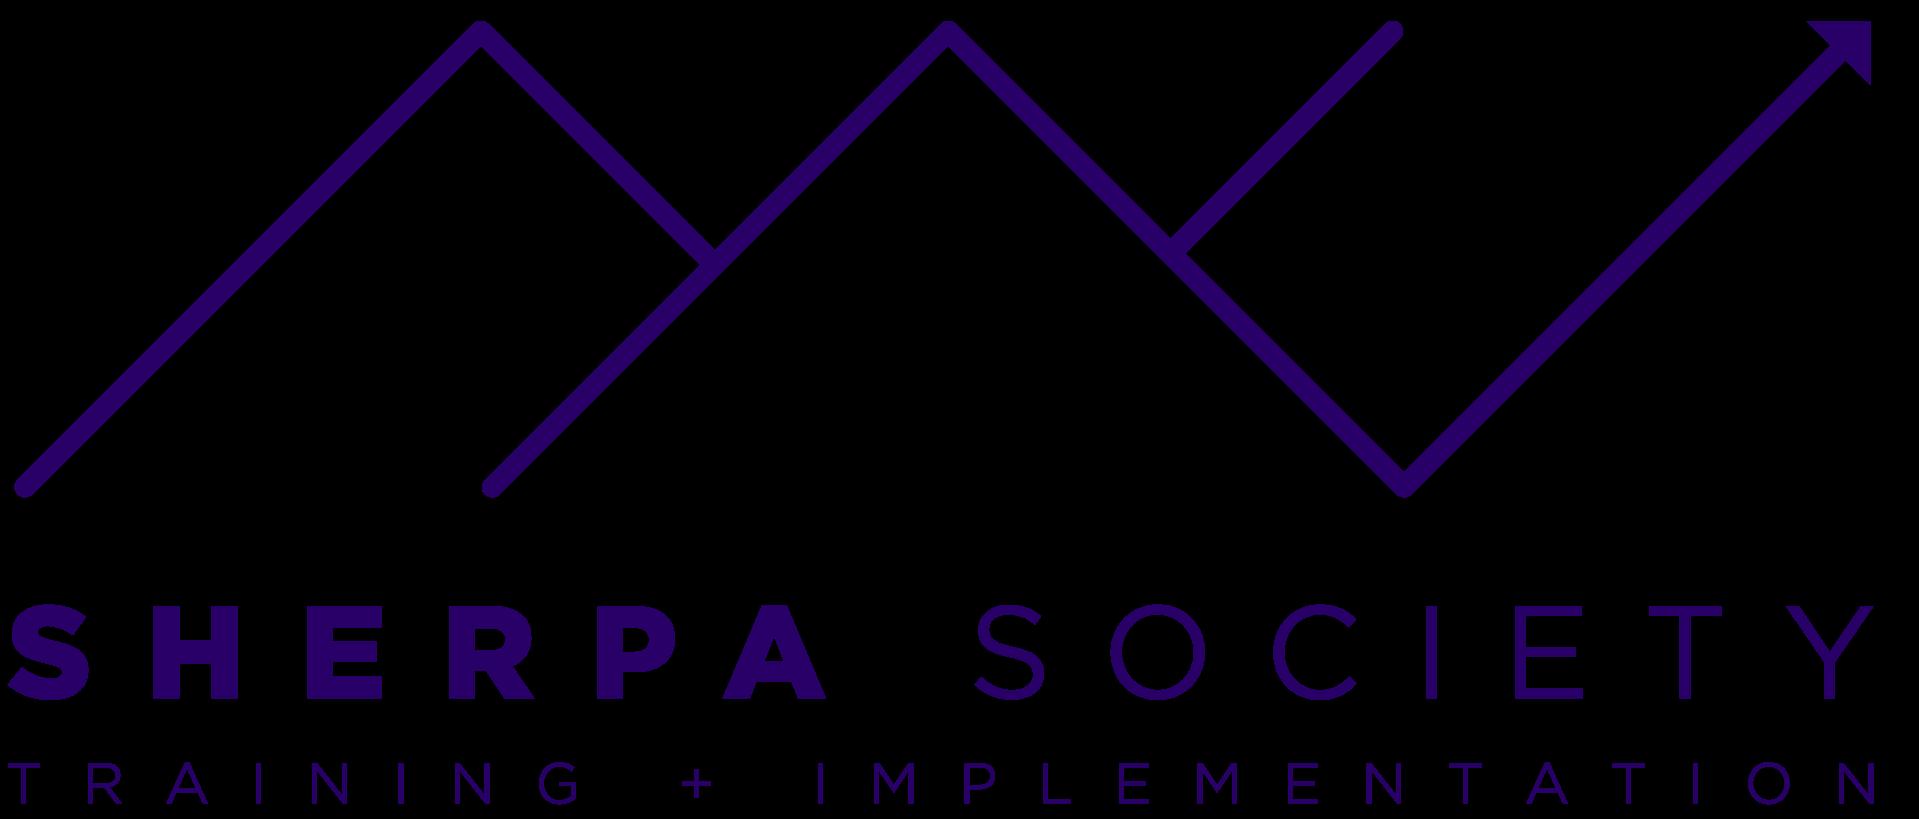 Sherpa Society